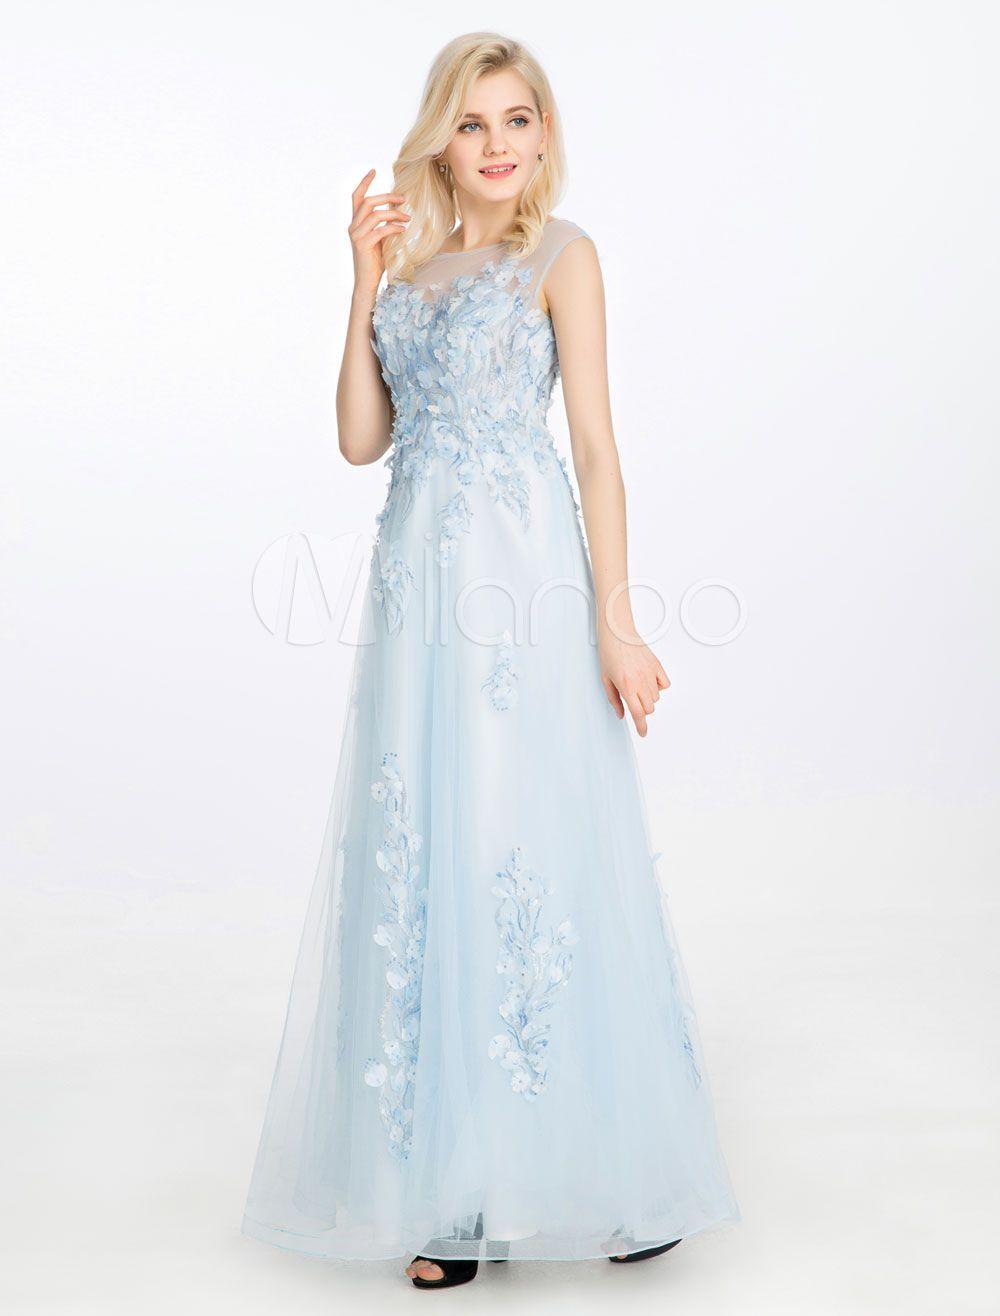 Blue prom dress lace d flowers applique party dress sweetheart